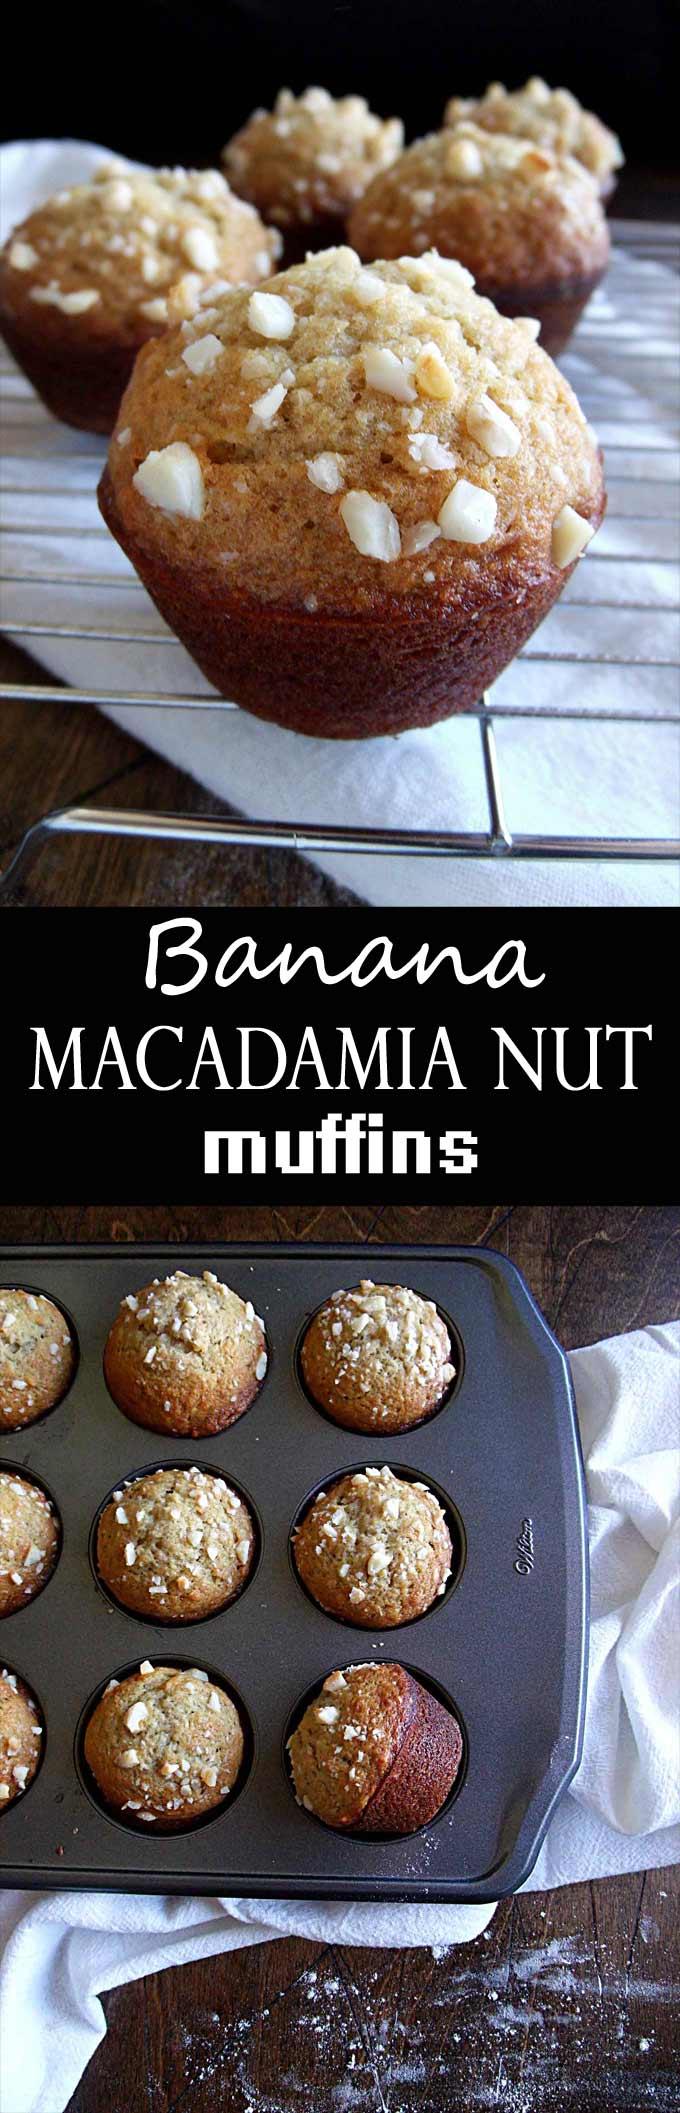 Banana Macadamia Nut Muffin - Inspired by the muffins at Huggo's in Kona, Hawaii!